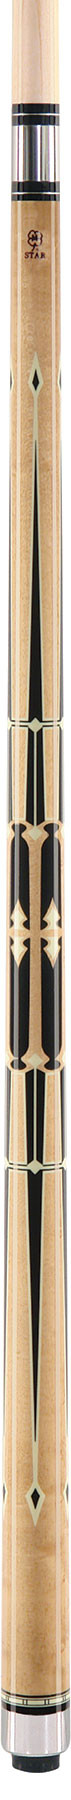 McDermott Star S63 Honey Billiards Pool Cue Stick